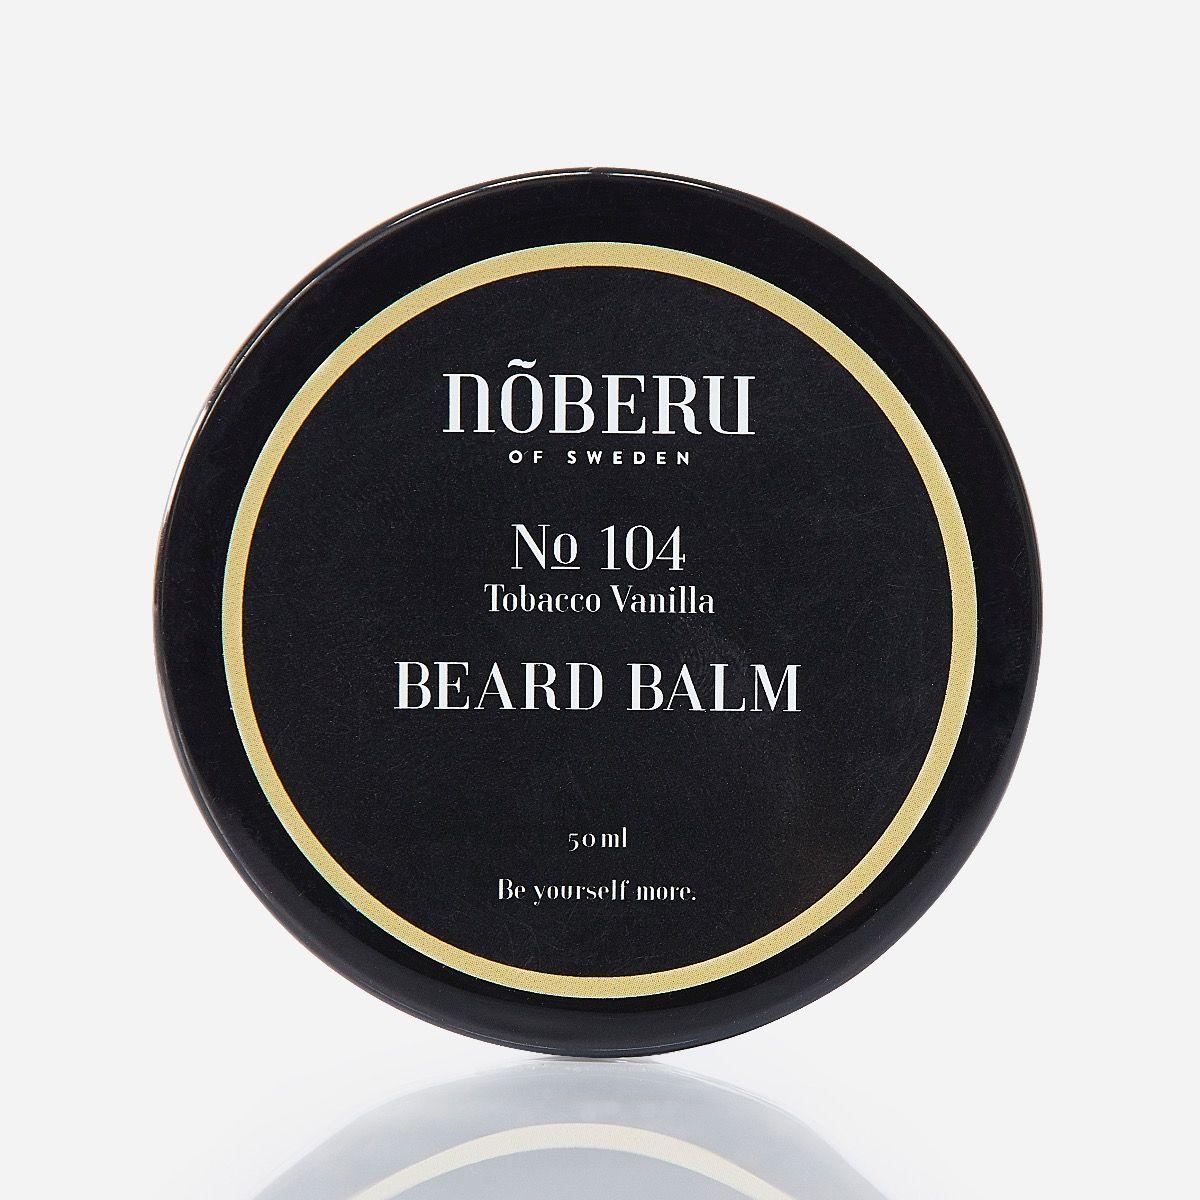 Nõberu Beard Balm Tobacco-Vanilla 50ml